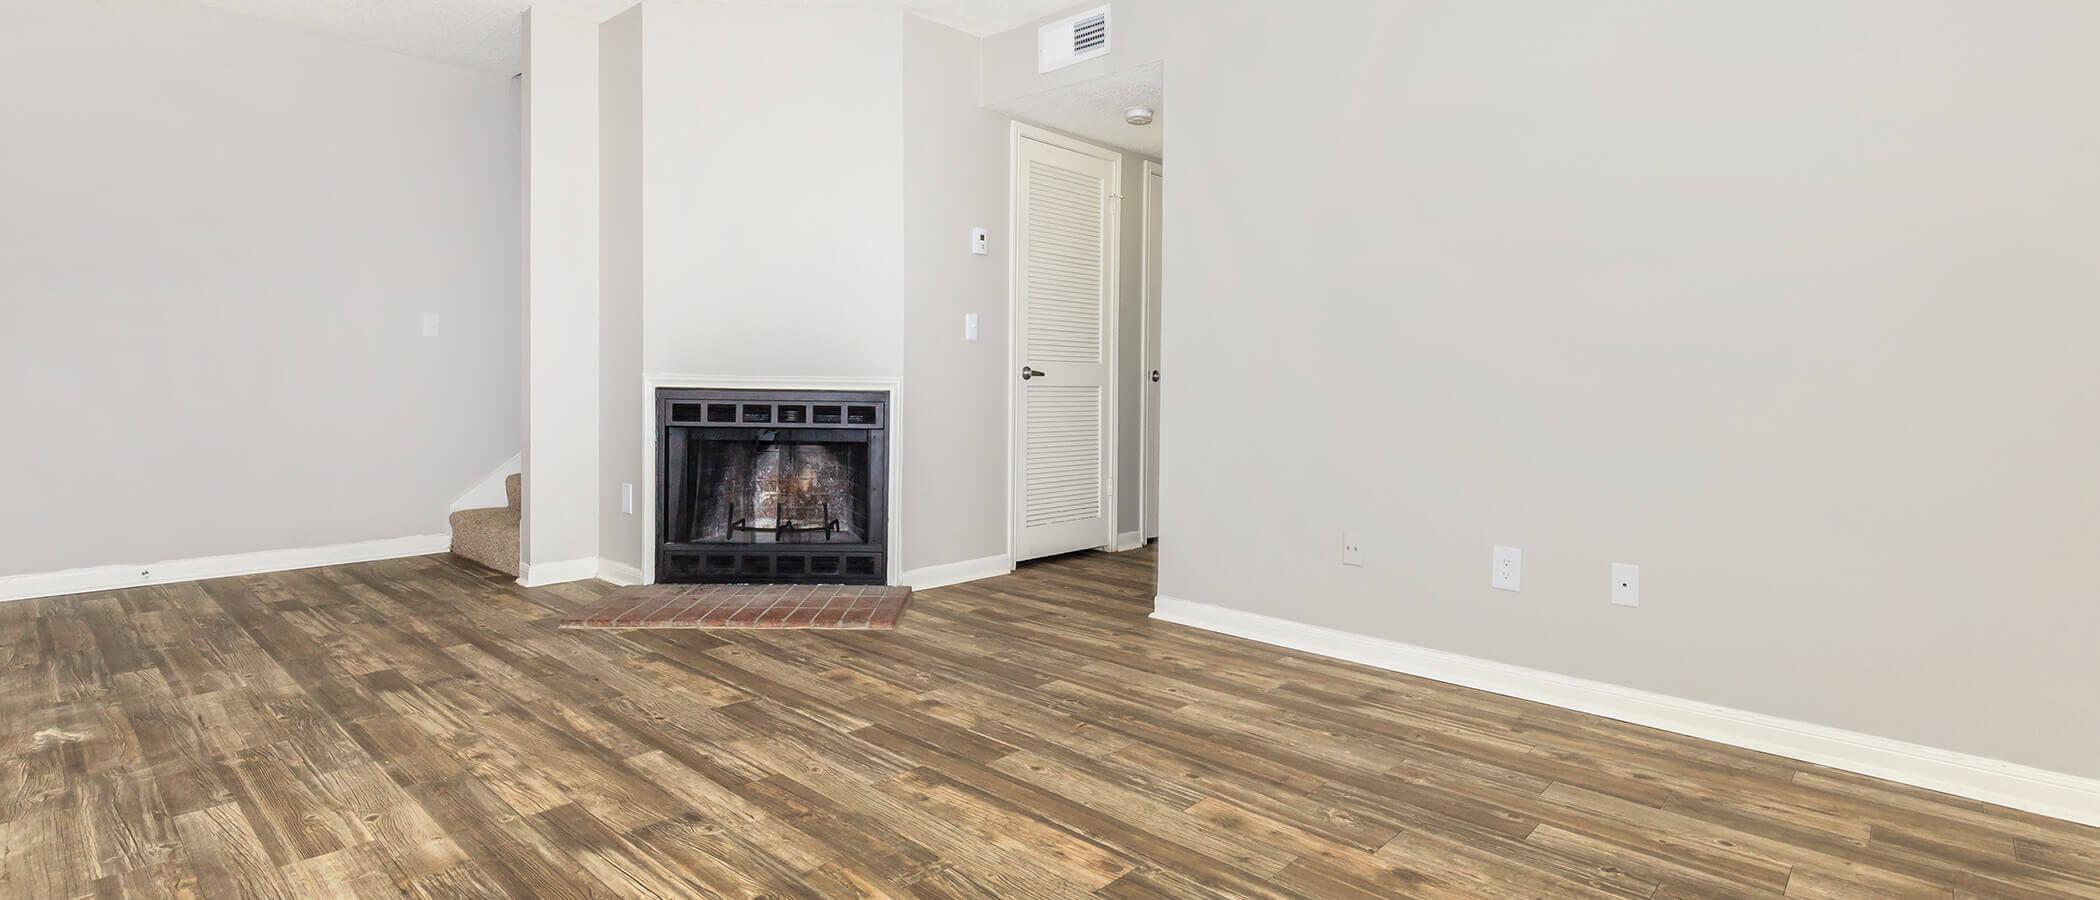 4 Bedroom Apartments In Nashville Tn Best Home Design 2018